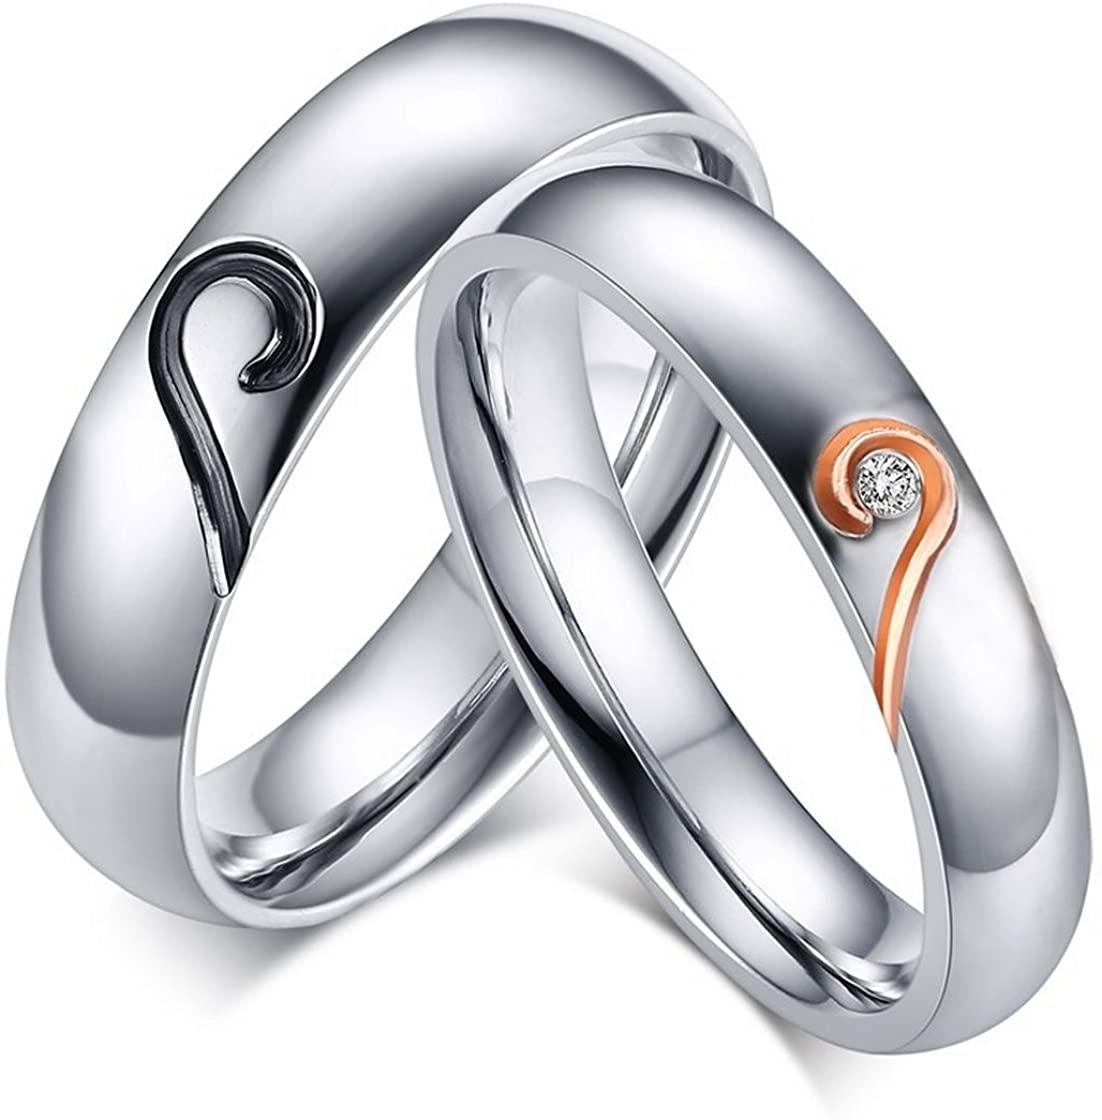 WOWJEW Jewelry & Romantic Love Heart Black Rose Gold Titanium Steel CZ Wedding Ring Engage Rings